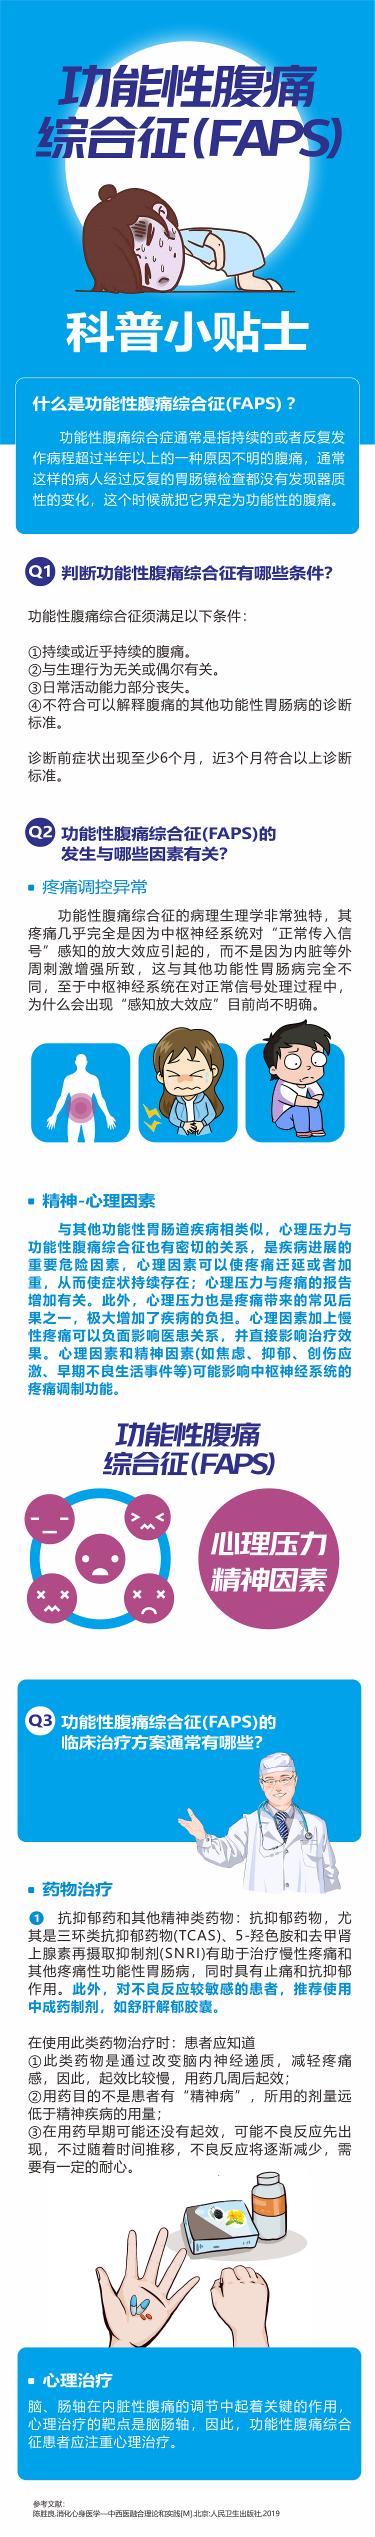 功能性腹痛综合征(FAPS)